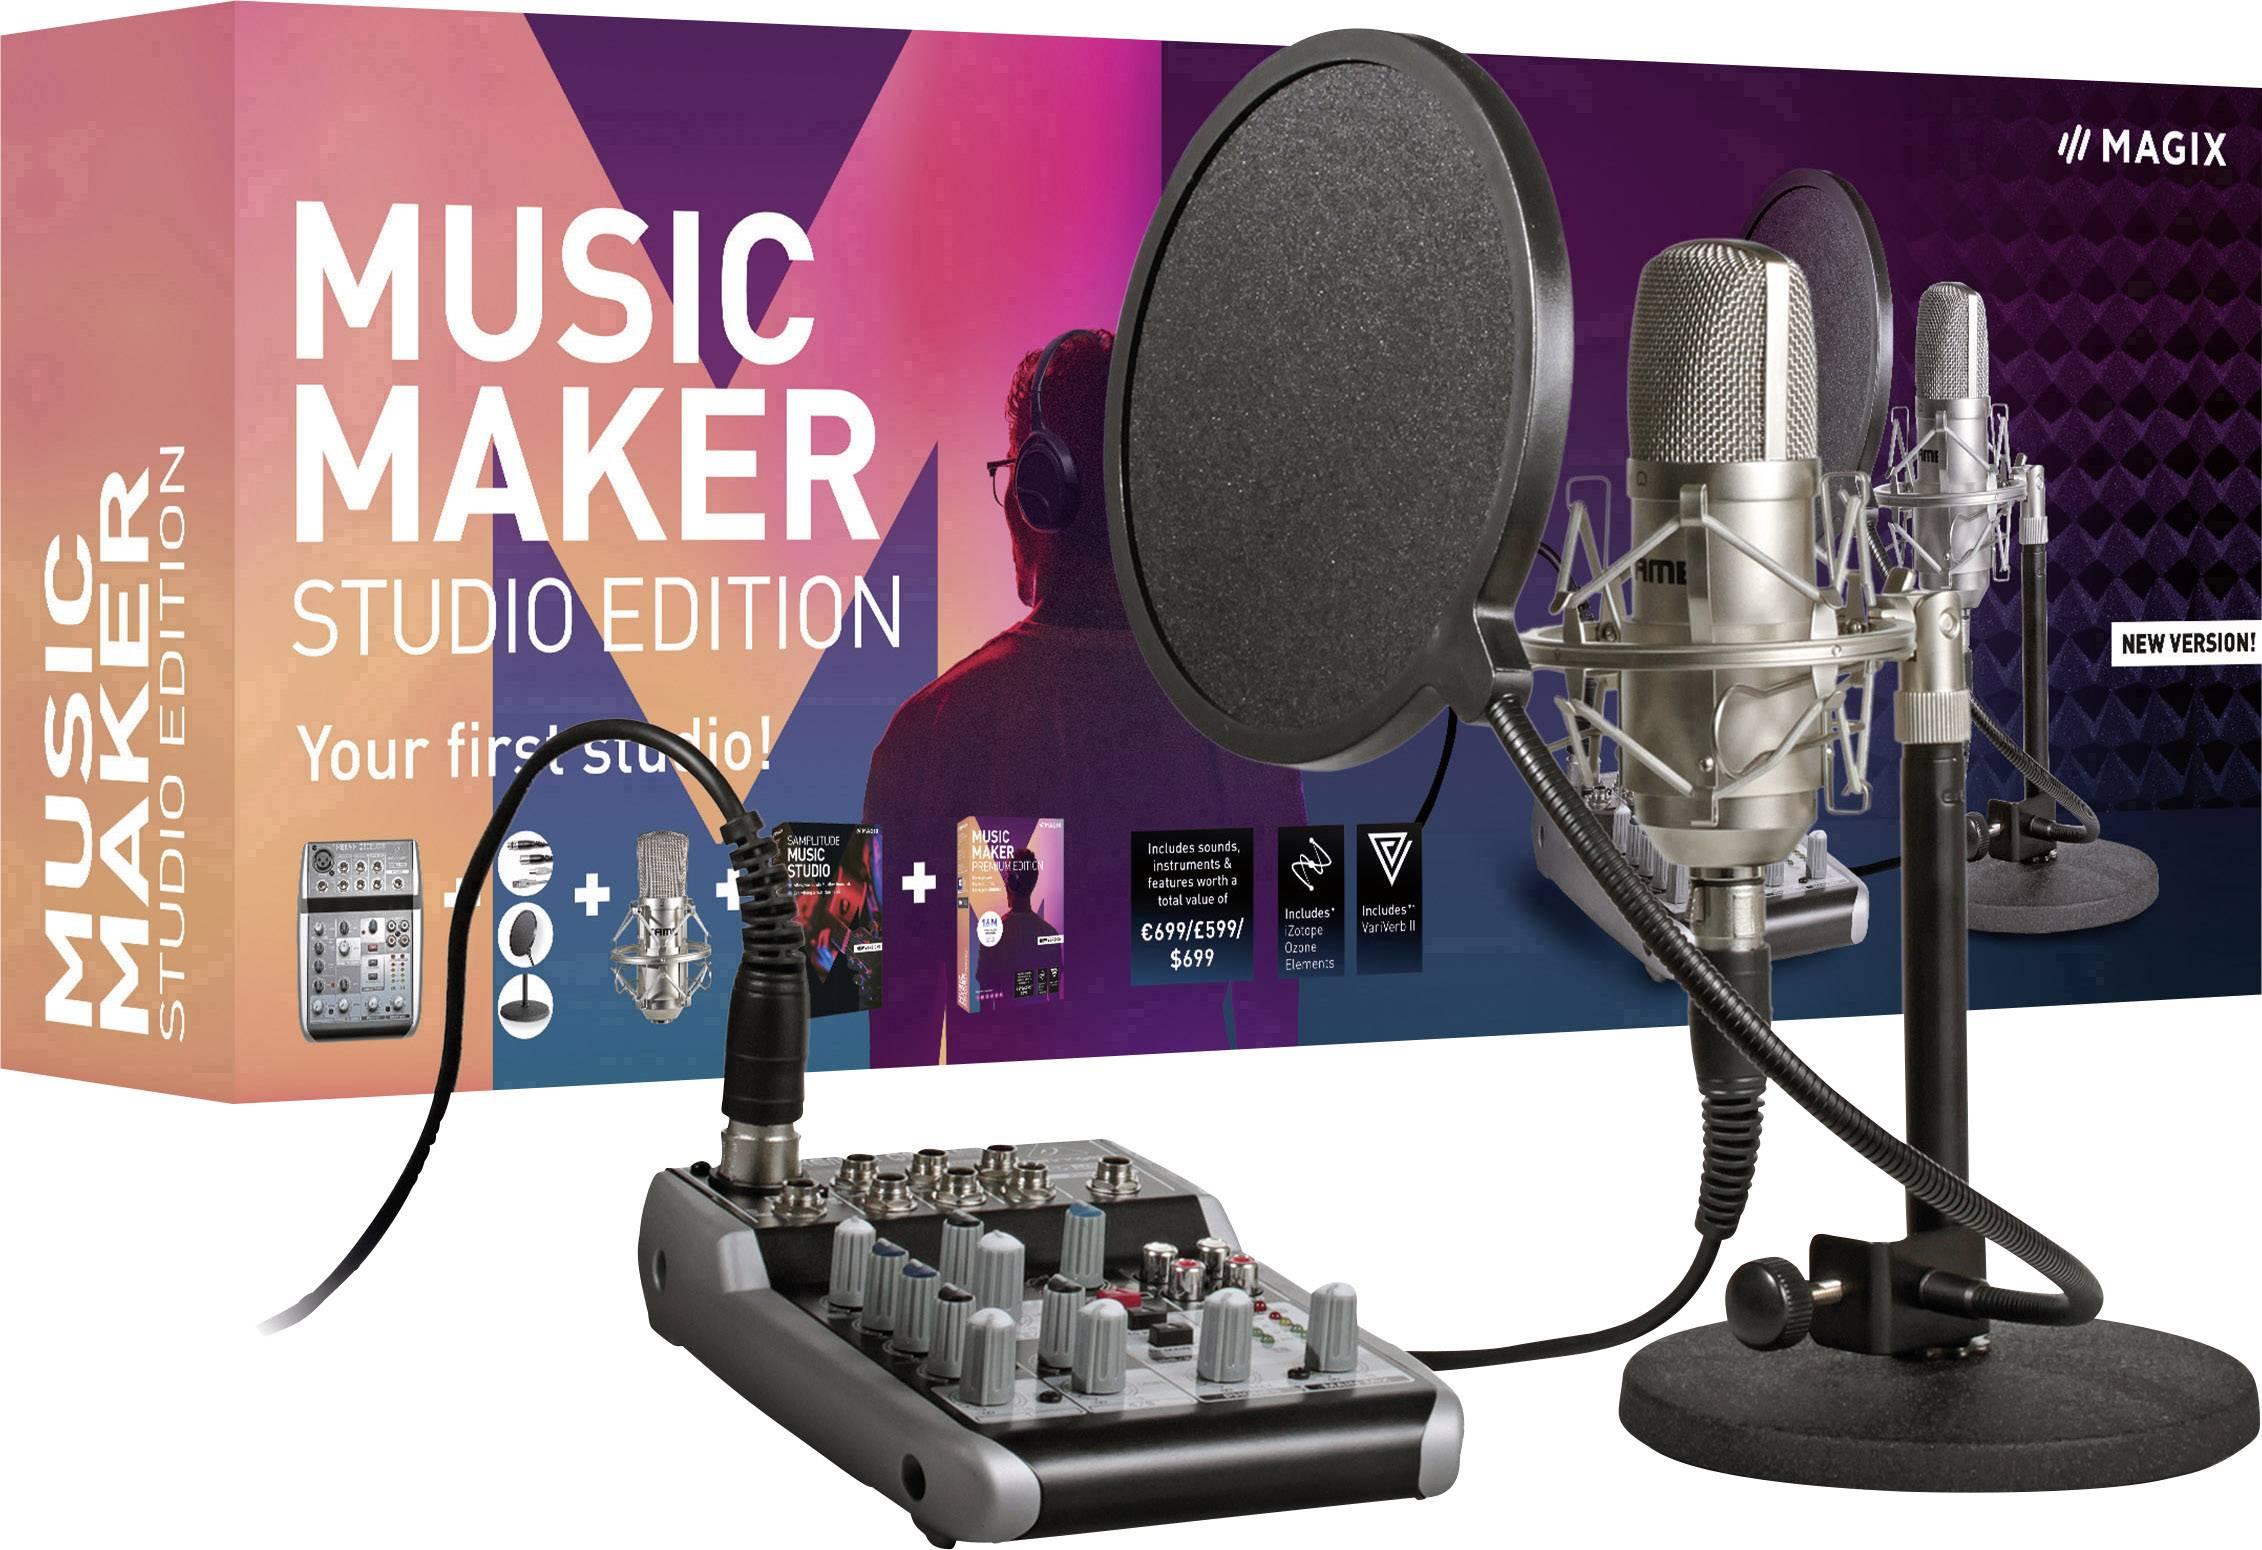 Magix Music Maker Studio Edition Full version, 1 license